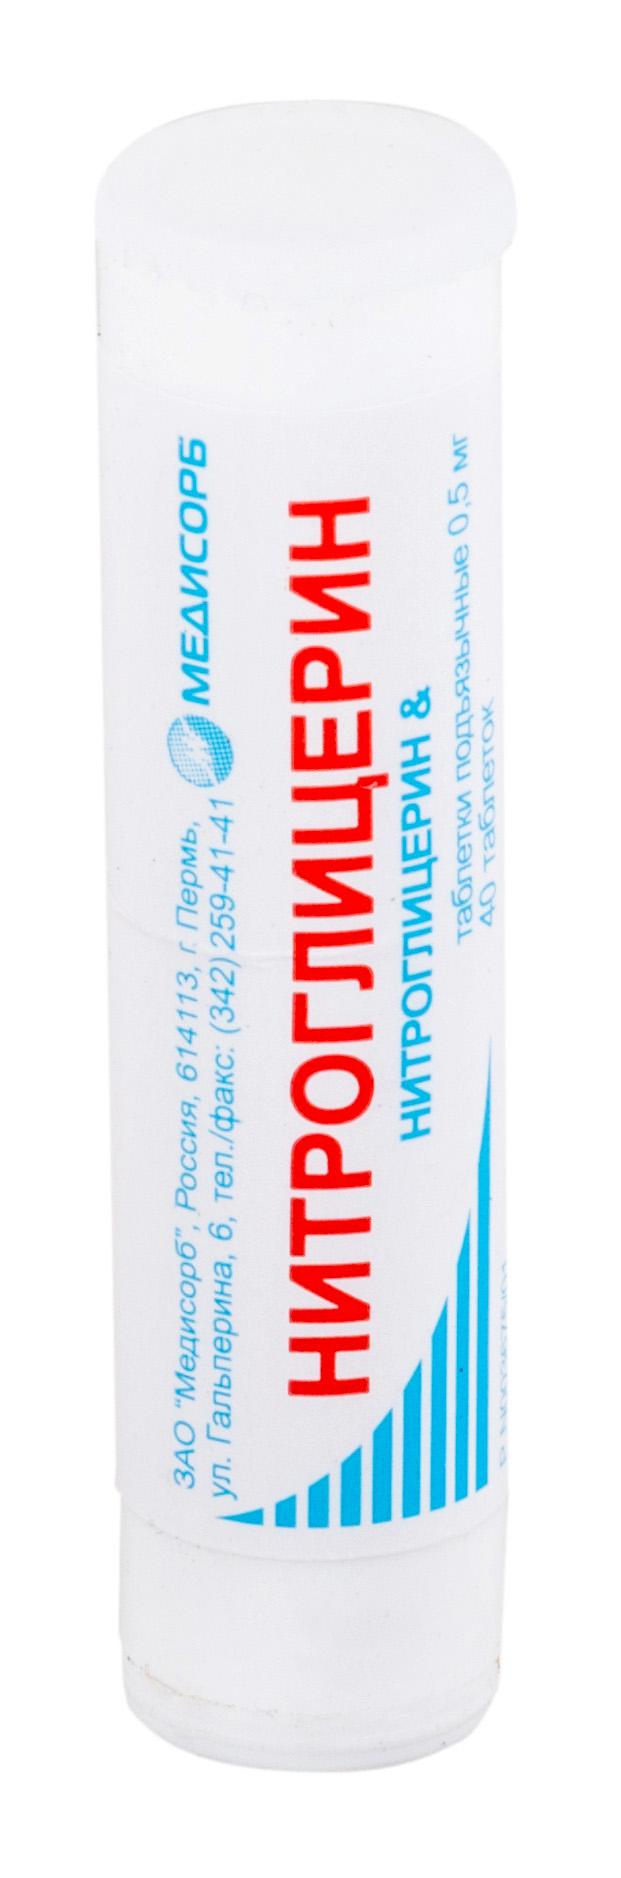 Нитроглицерин таблетки сублингв. 0,5мг №40 Медисорб